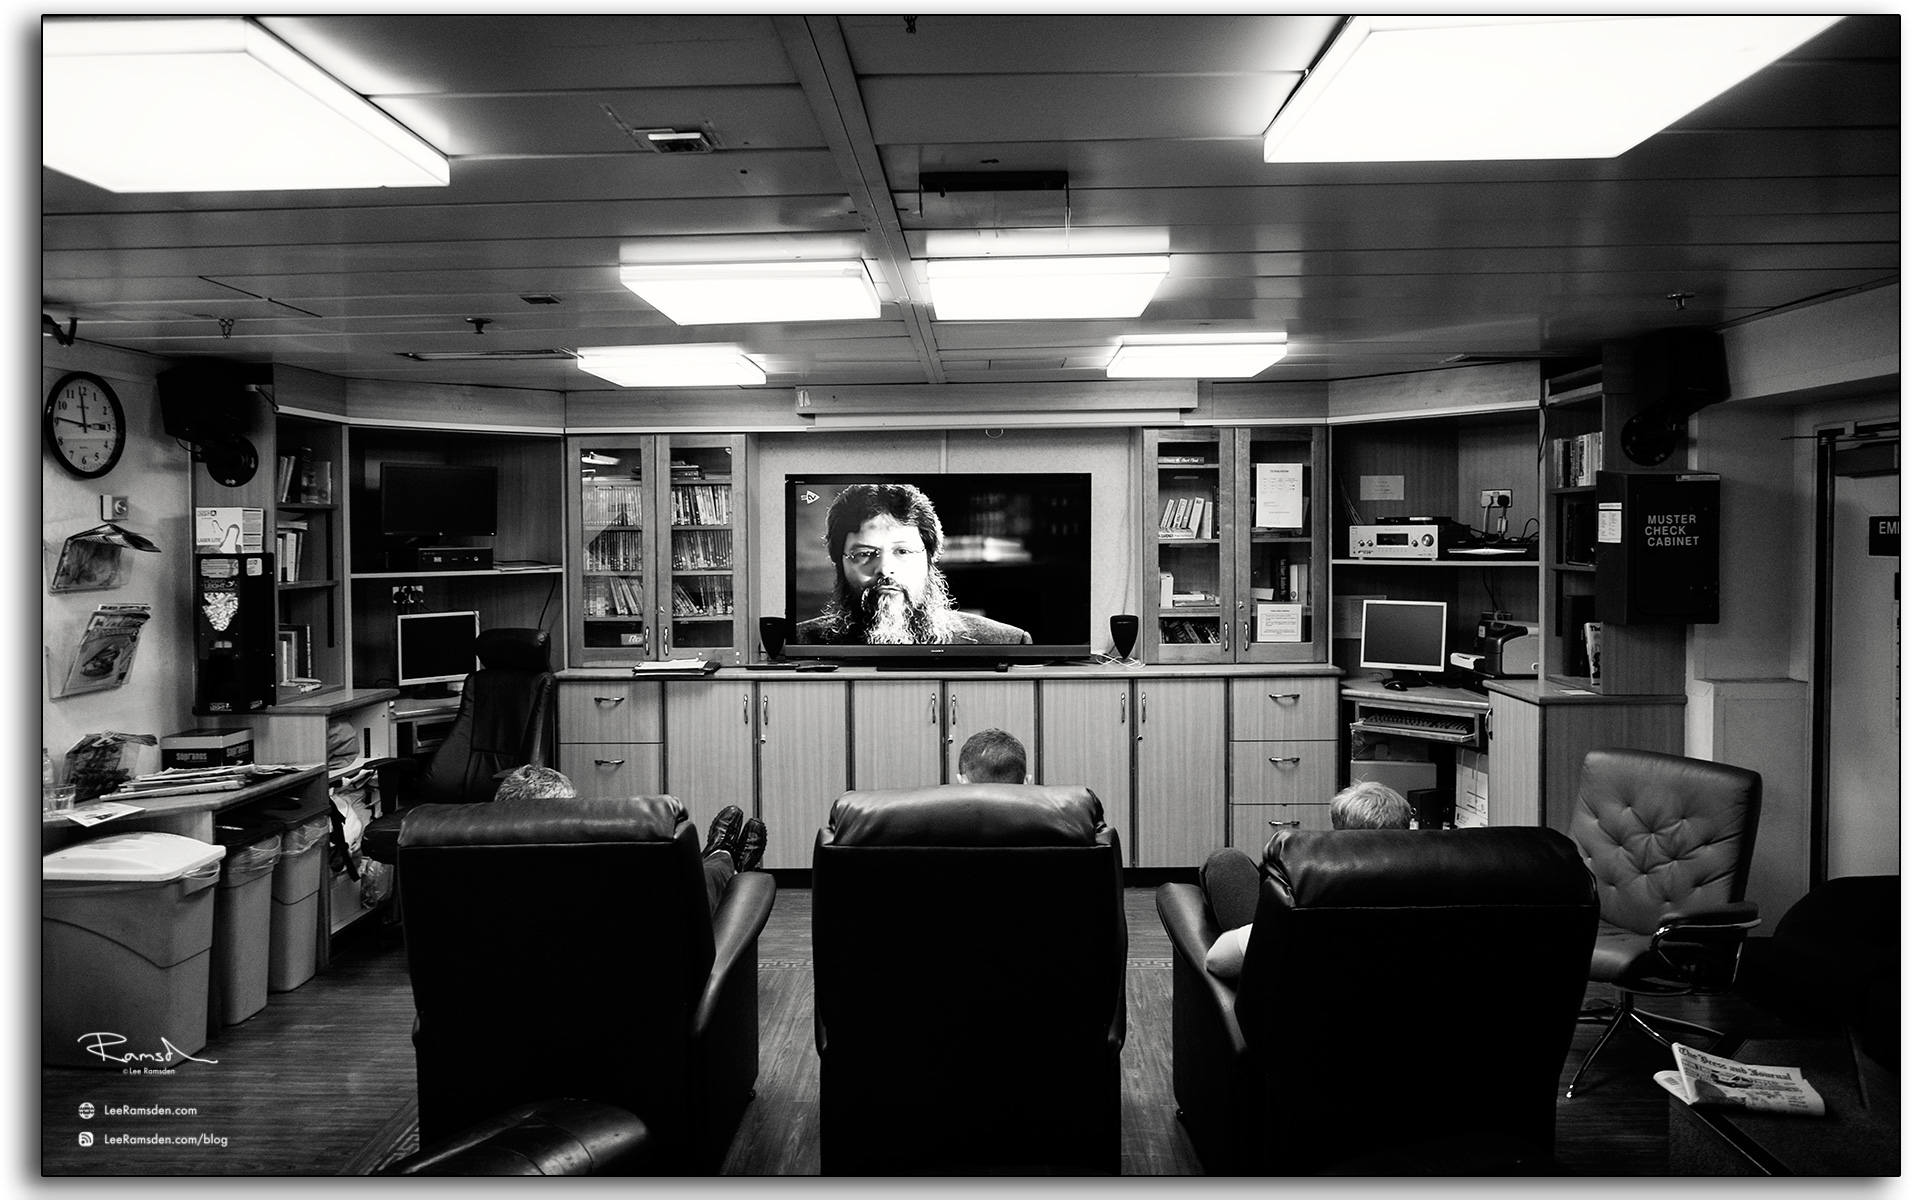 24 Auk Oil rig platform Talisman TV lounge workers watching tv